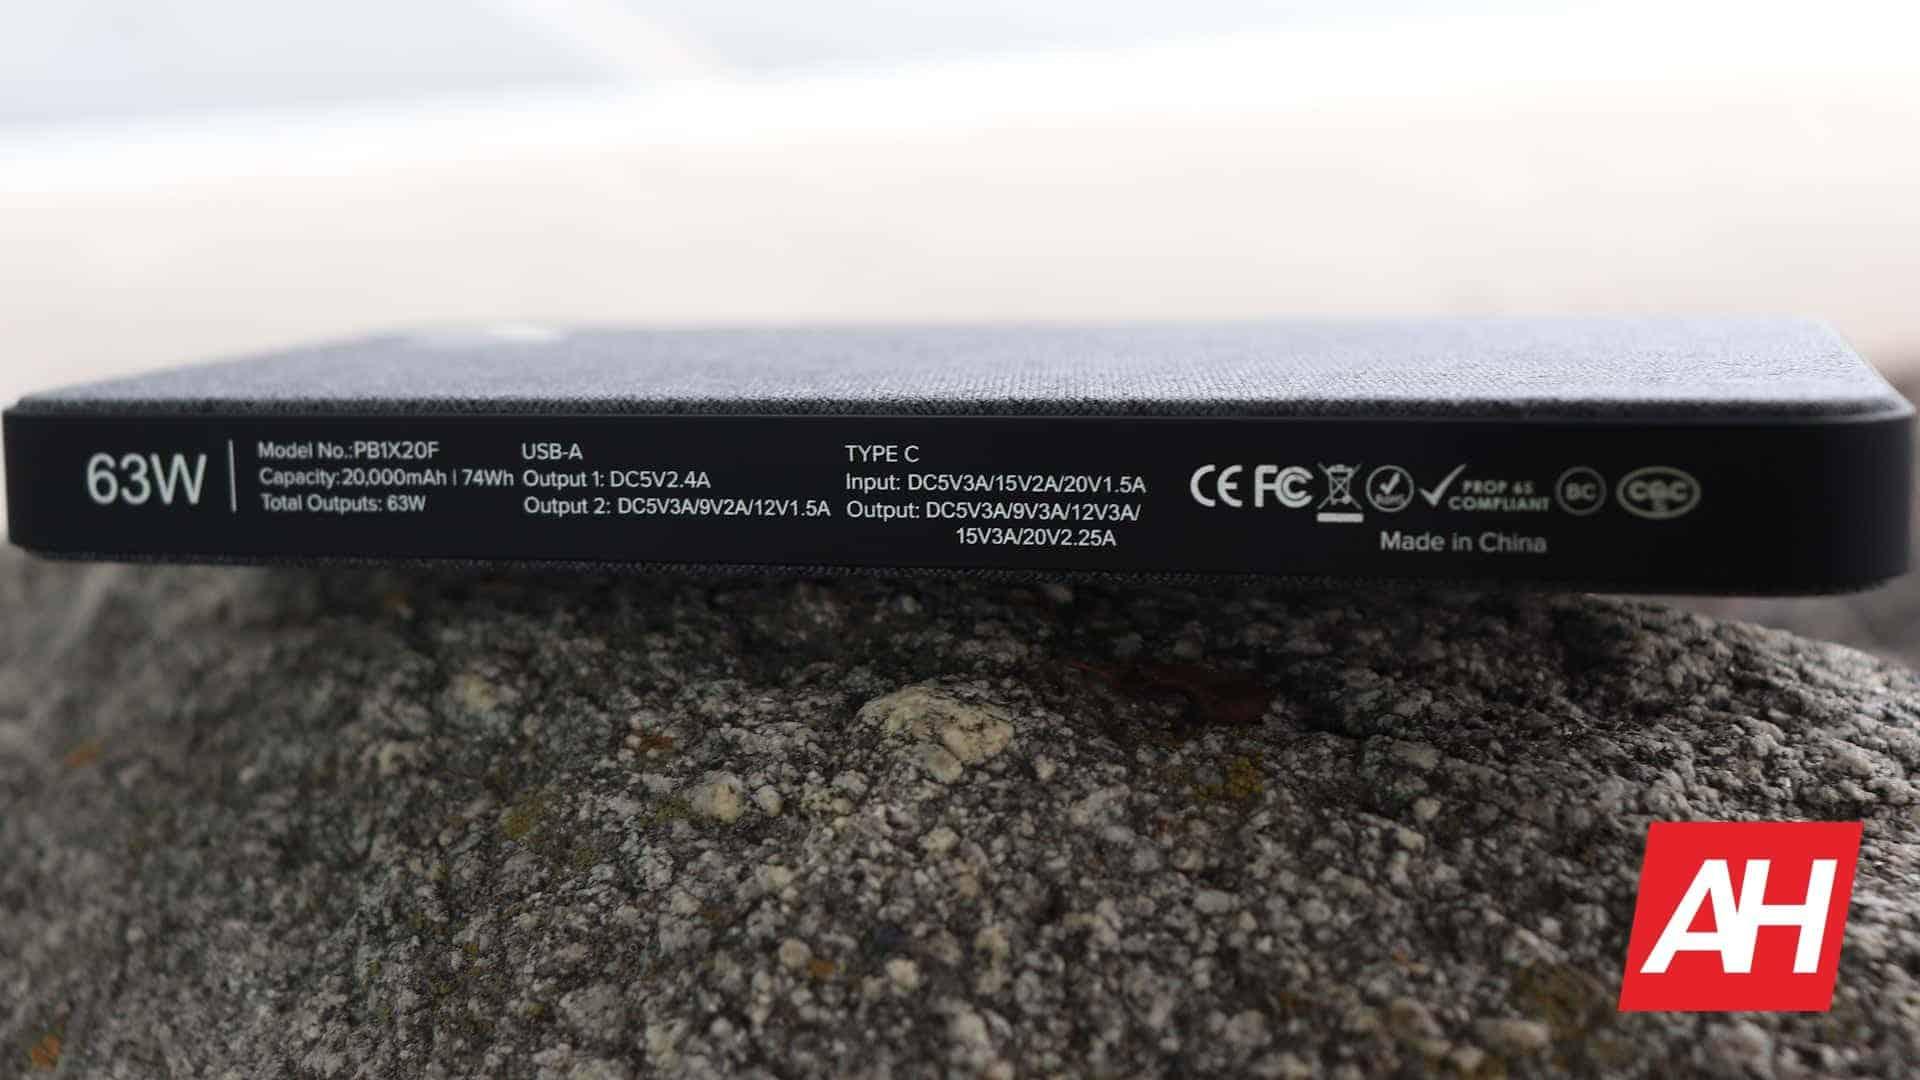 04 1 hardware Eggtronic PB1X20F Laptop Powerbank Review DG AH 2020